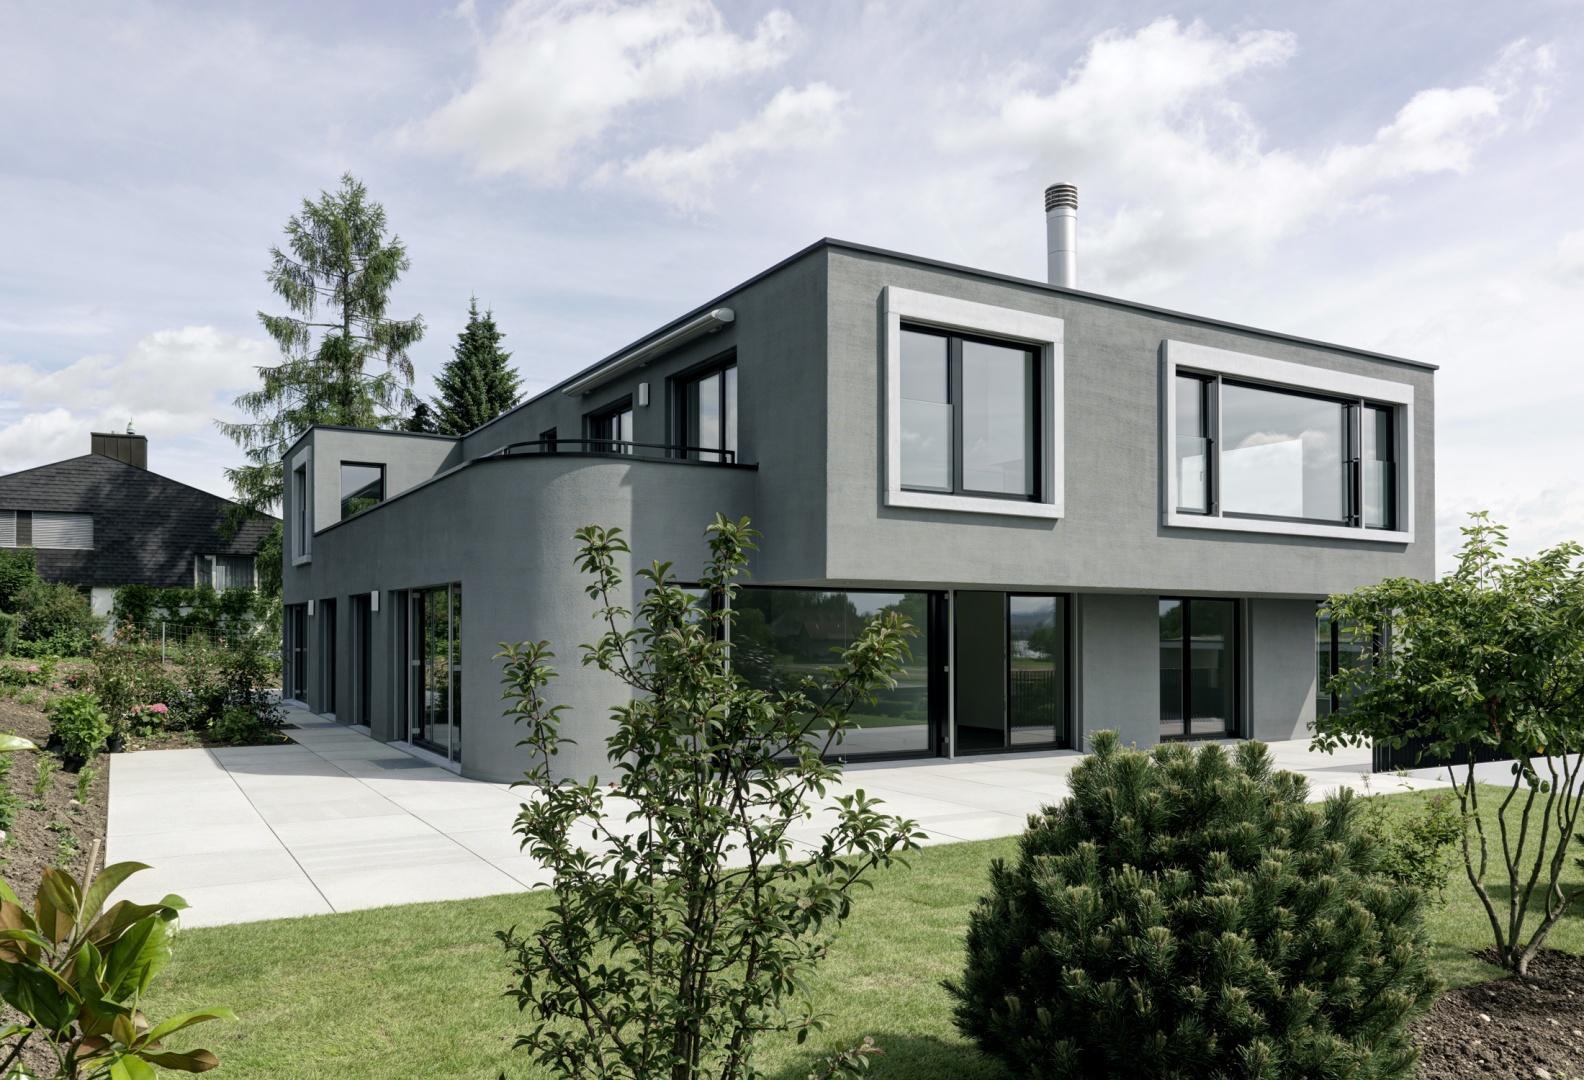 mehrfamilienhaus maur schweizer baudokumentation. Black Bedroom Furniture Sets. Home Design Ideas